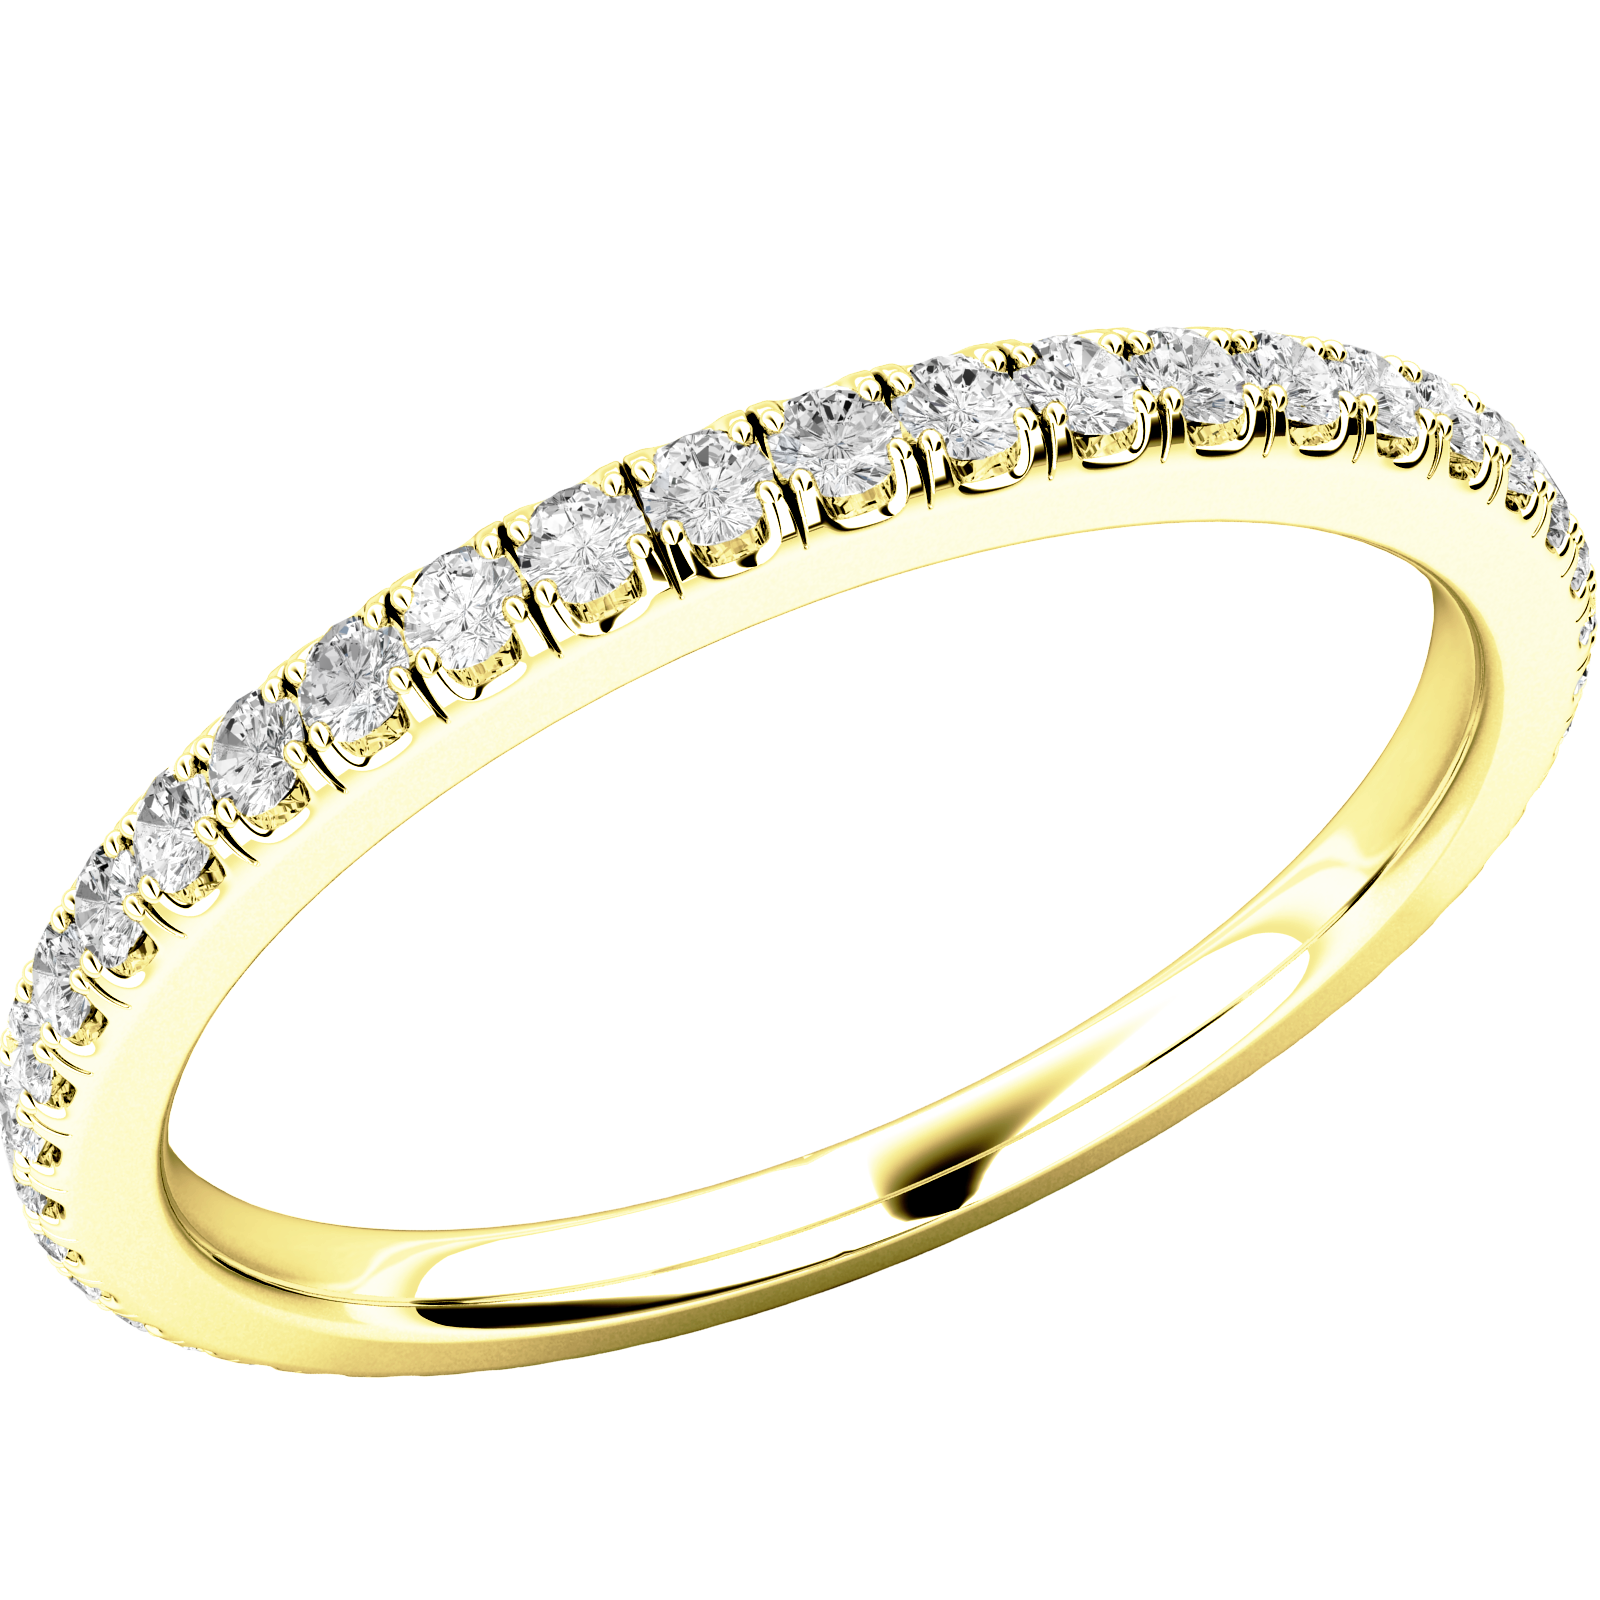 Verigheta cu Diamant/ Inel Eternity Dama Aur Galben 18kt cu Diamante Rotund Briliant in Setare Gheare pe toata Banda-img1